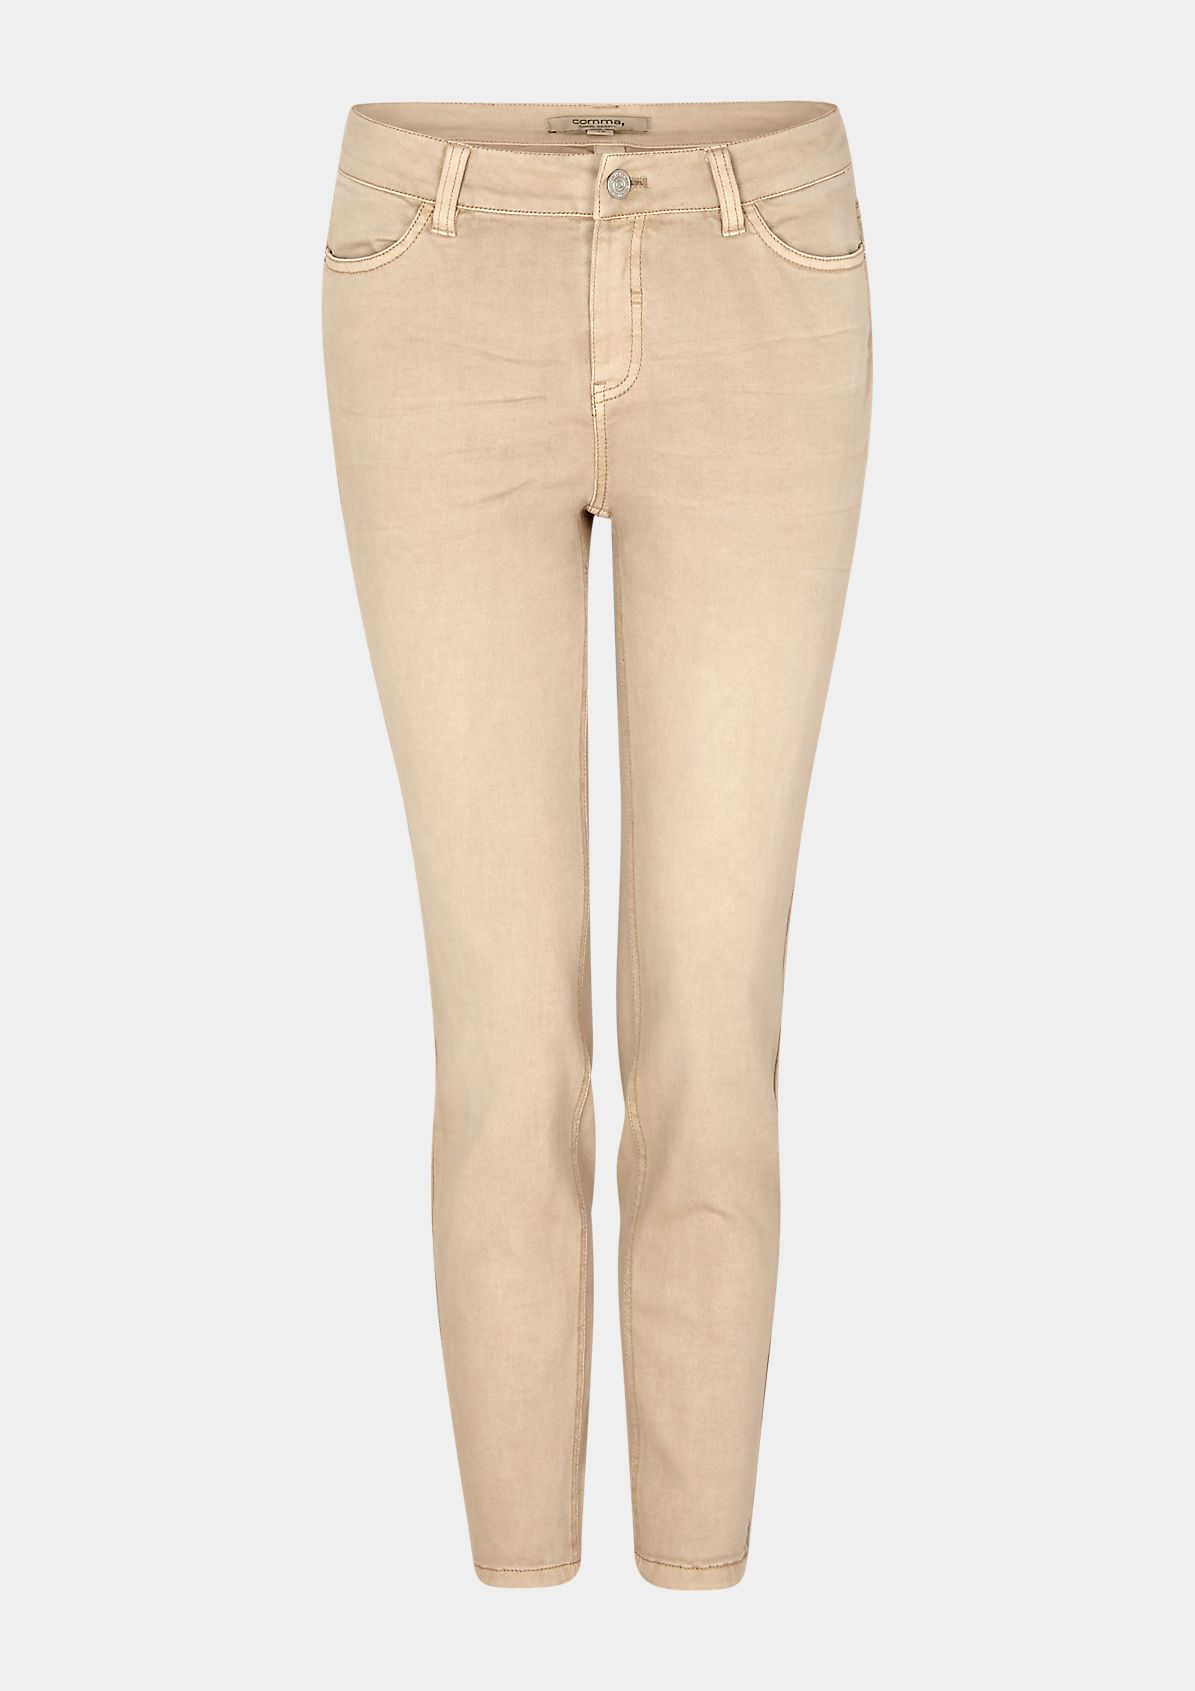 Skinny Fit: Skinny leg-Coloured Denim